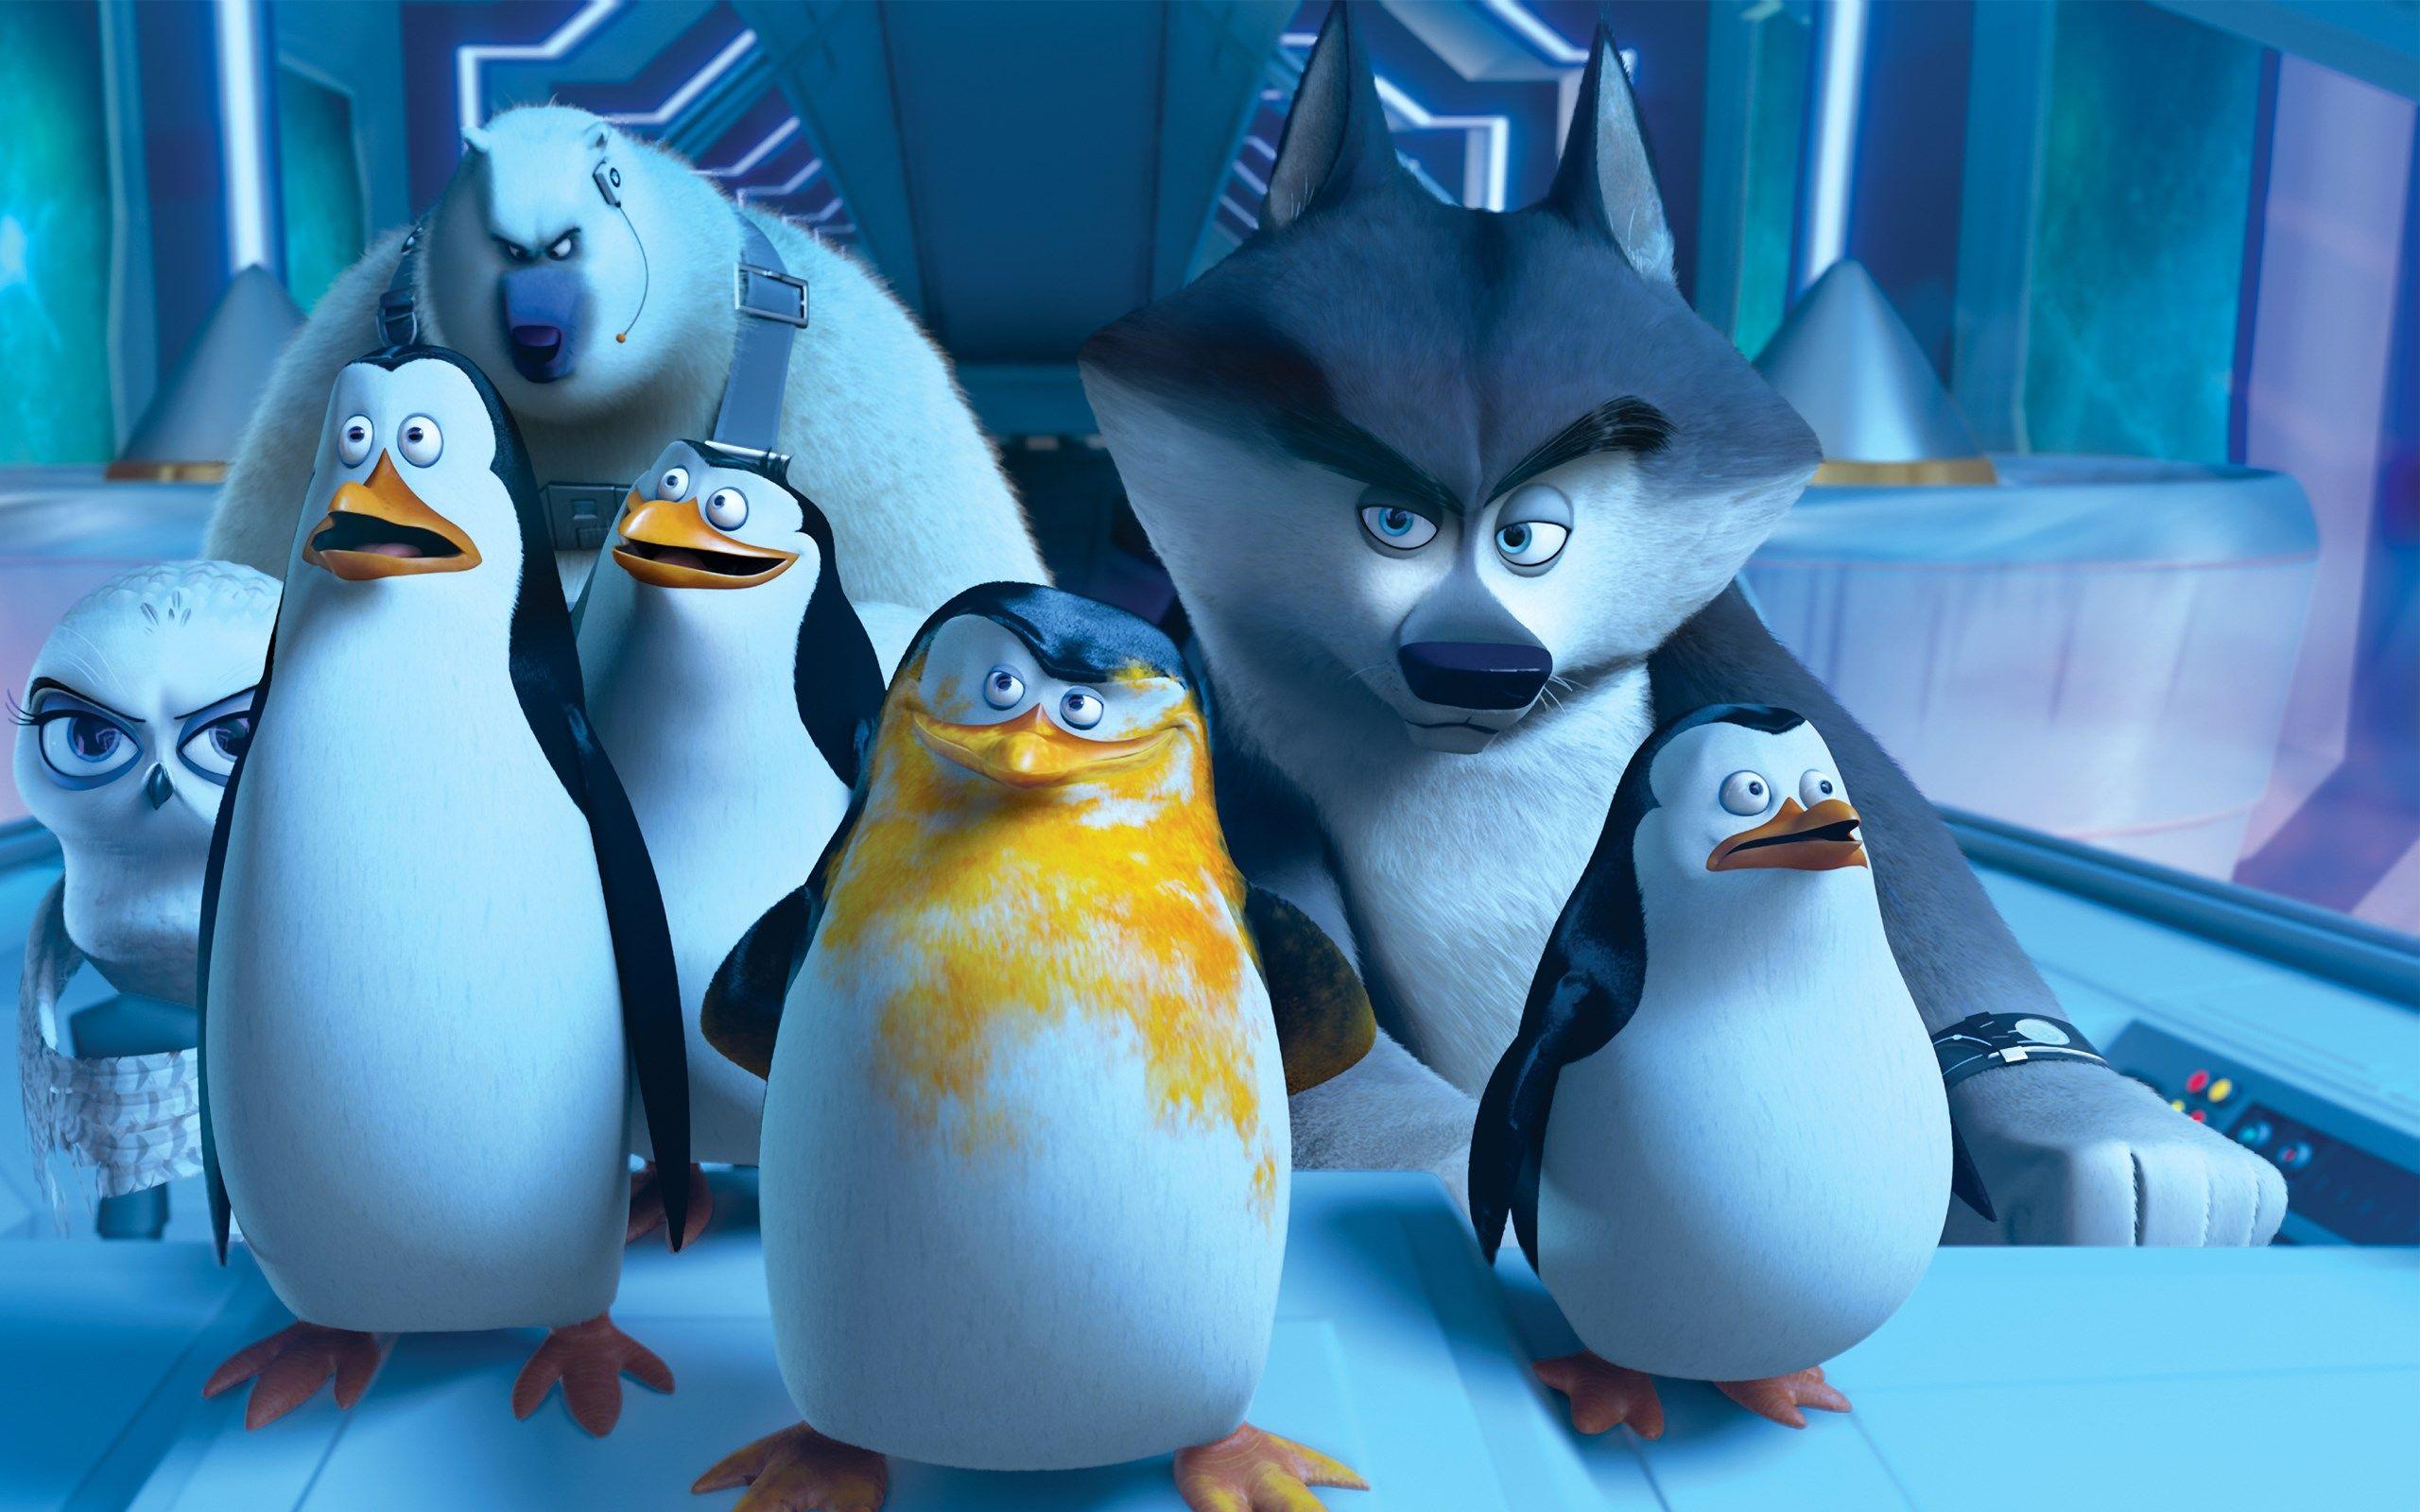 penguins of madagascar wallpaper - full hd wallpapers, photos